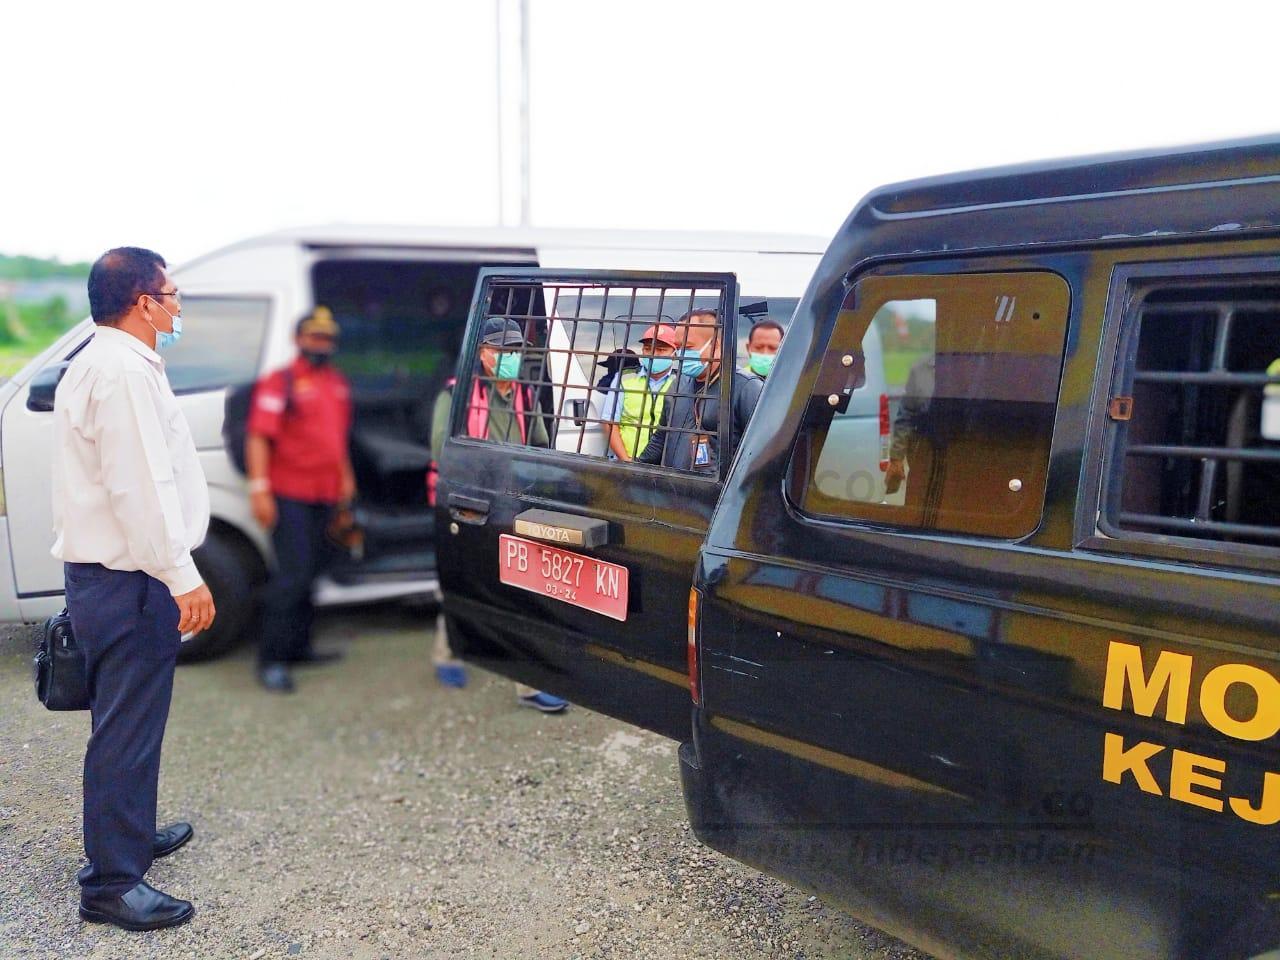 Kabur ke Jakarta, Terpidana Kasus Amdal Teluk Wondama Ini Ditangkap di Cilincing 26 IMG 20201214 WA0035